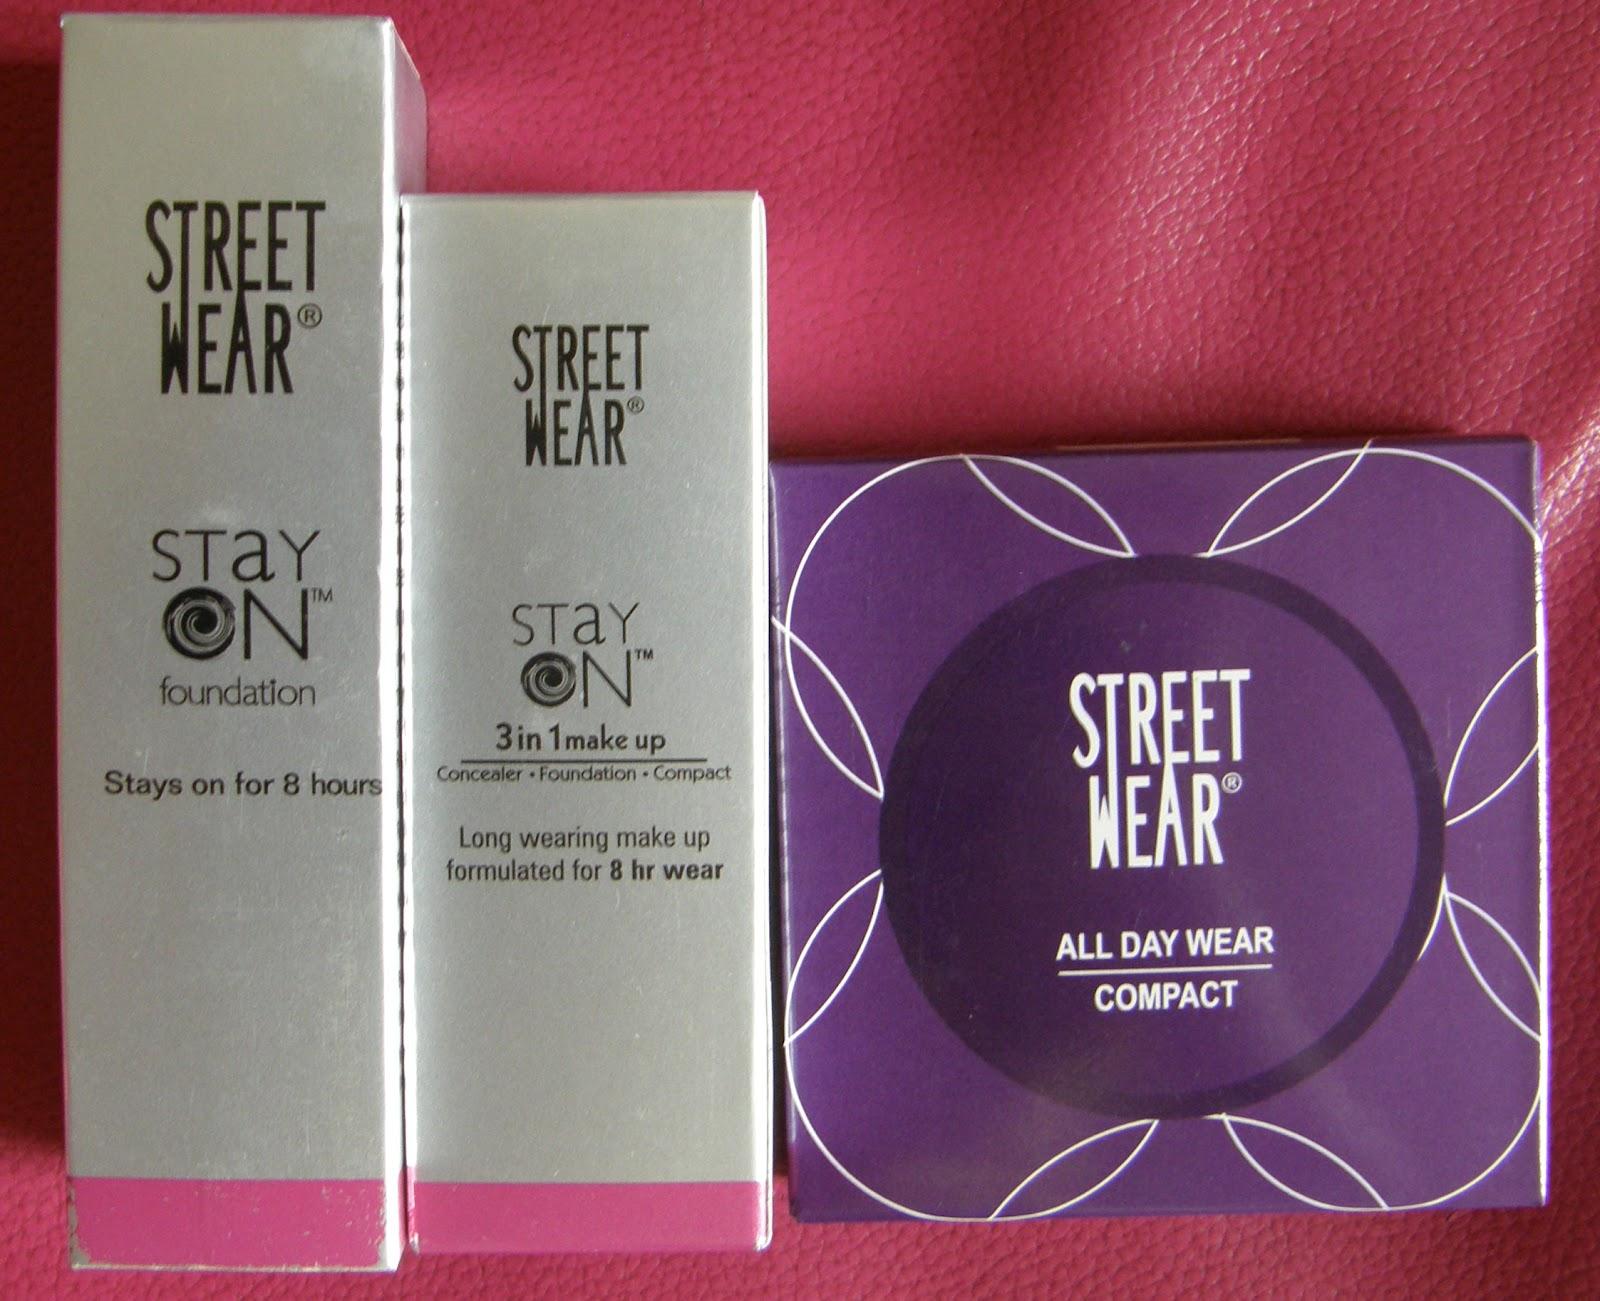 Street Wear Face Makeup Image